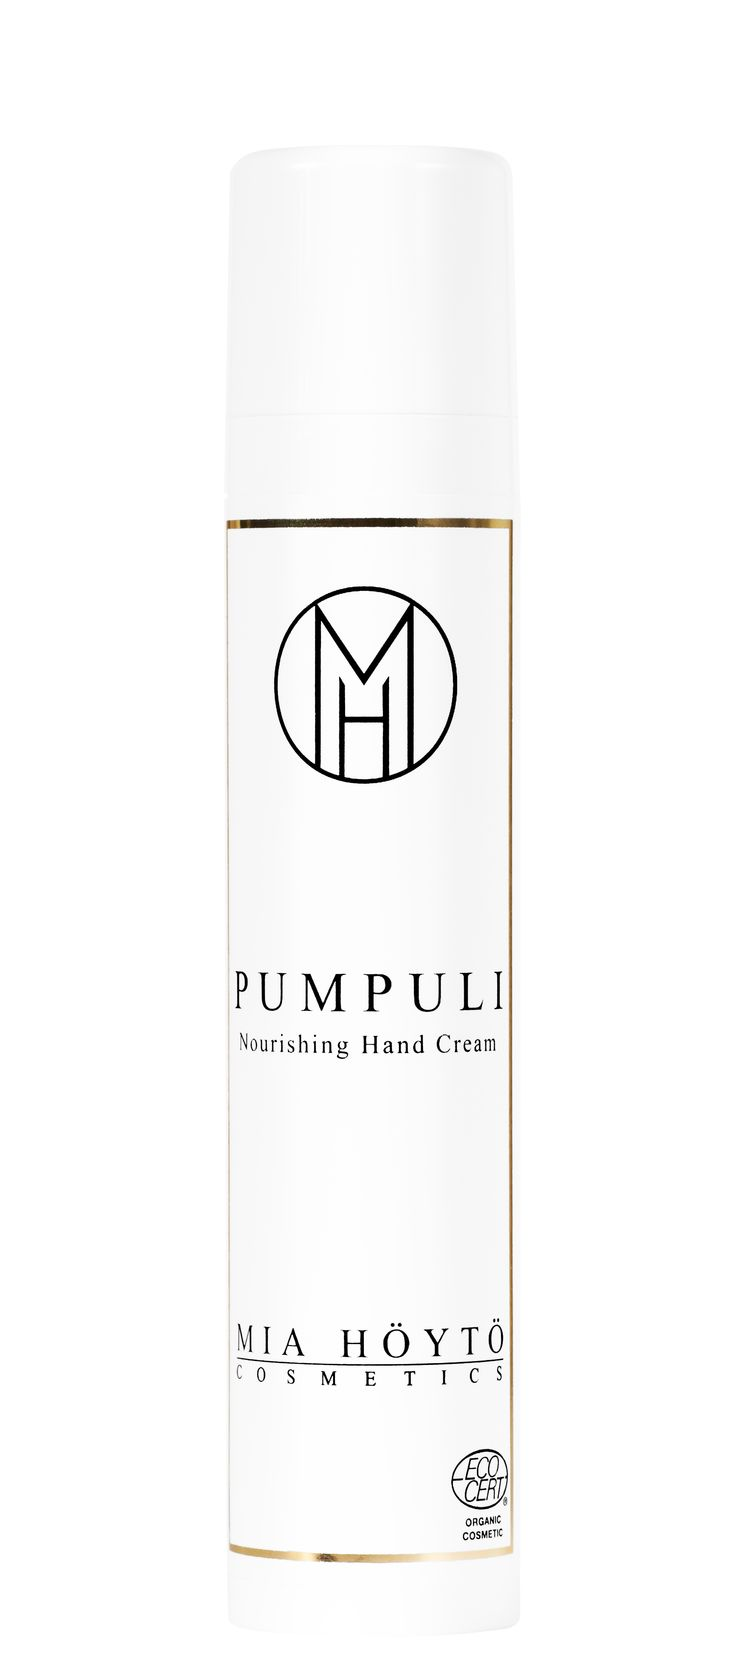 Pumpuli Hand Cream